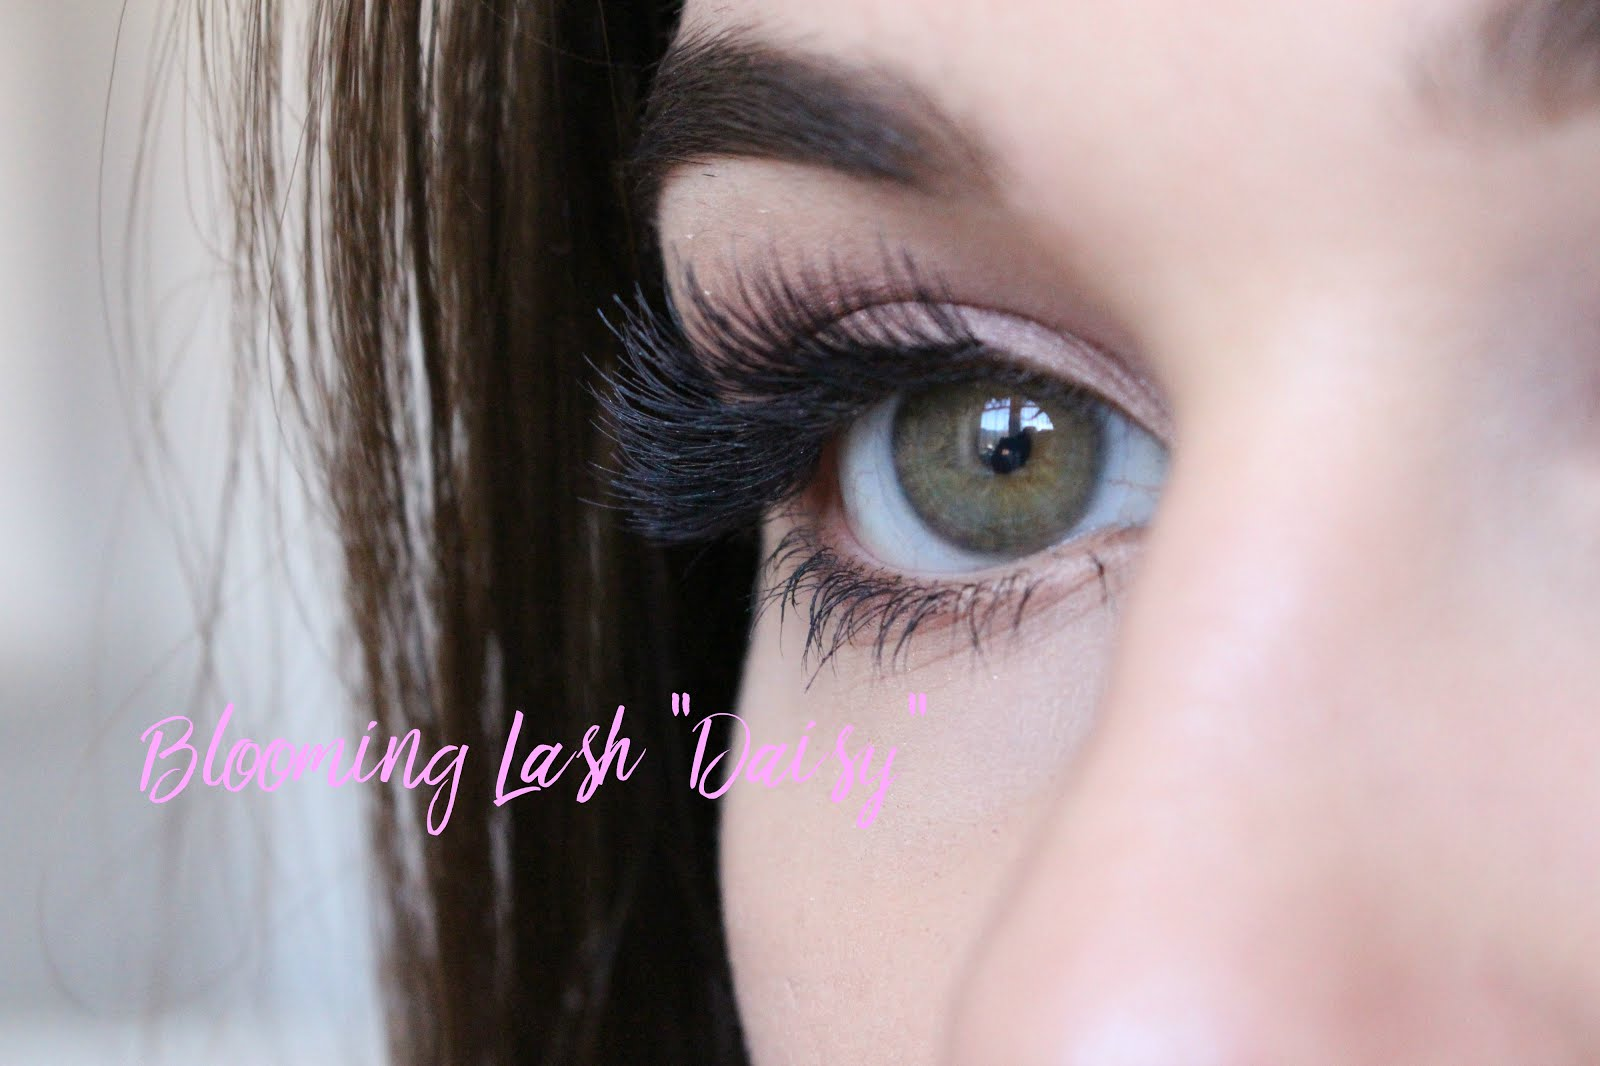 kiss lashes, kiss lashes daisy, kiss lashes müller, günstige wimpern, falsche wimpern günstig, kiss natural flourish blooming lash, kiss natural flourish blooming lash daisy, nelly ray, nelly ray blog